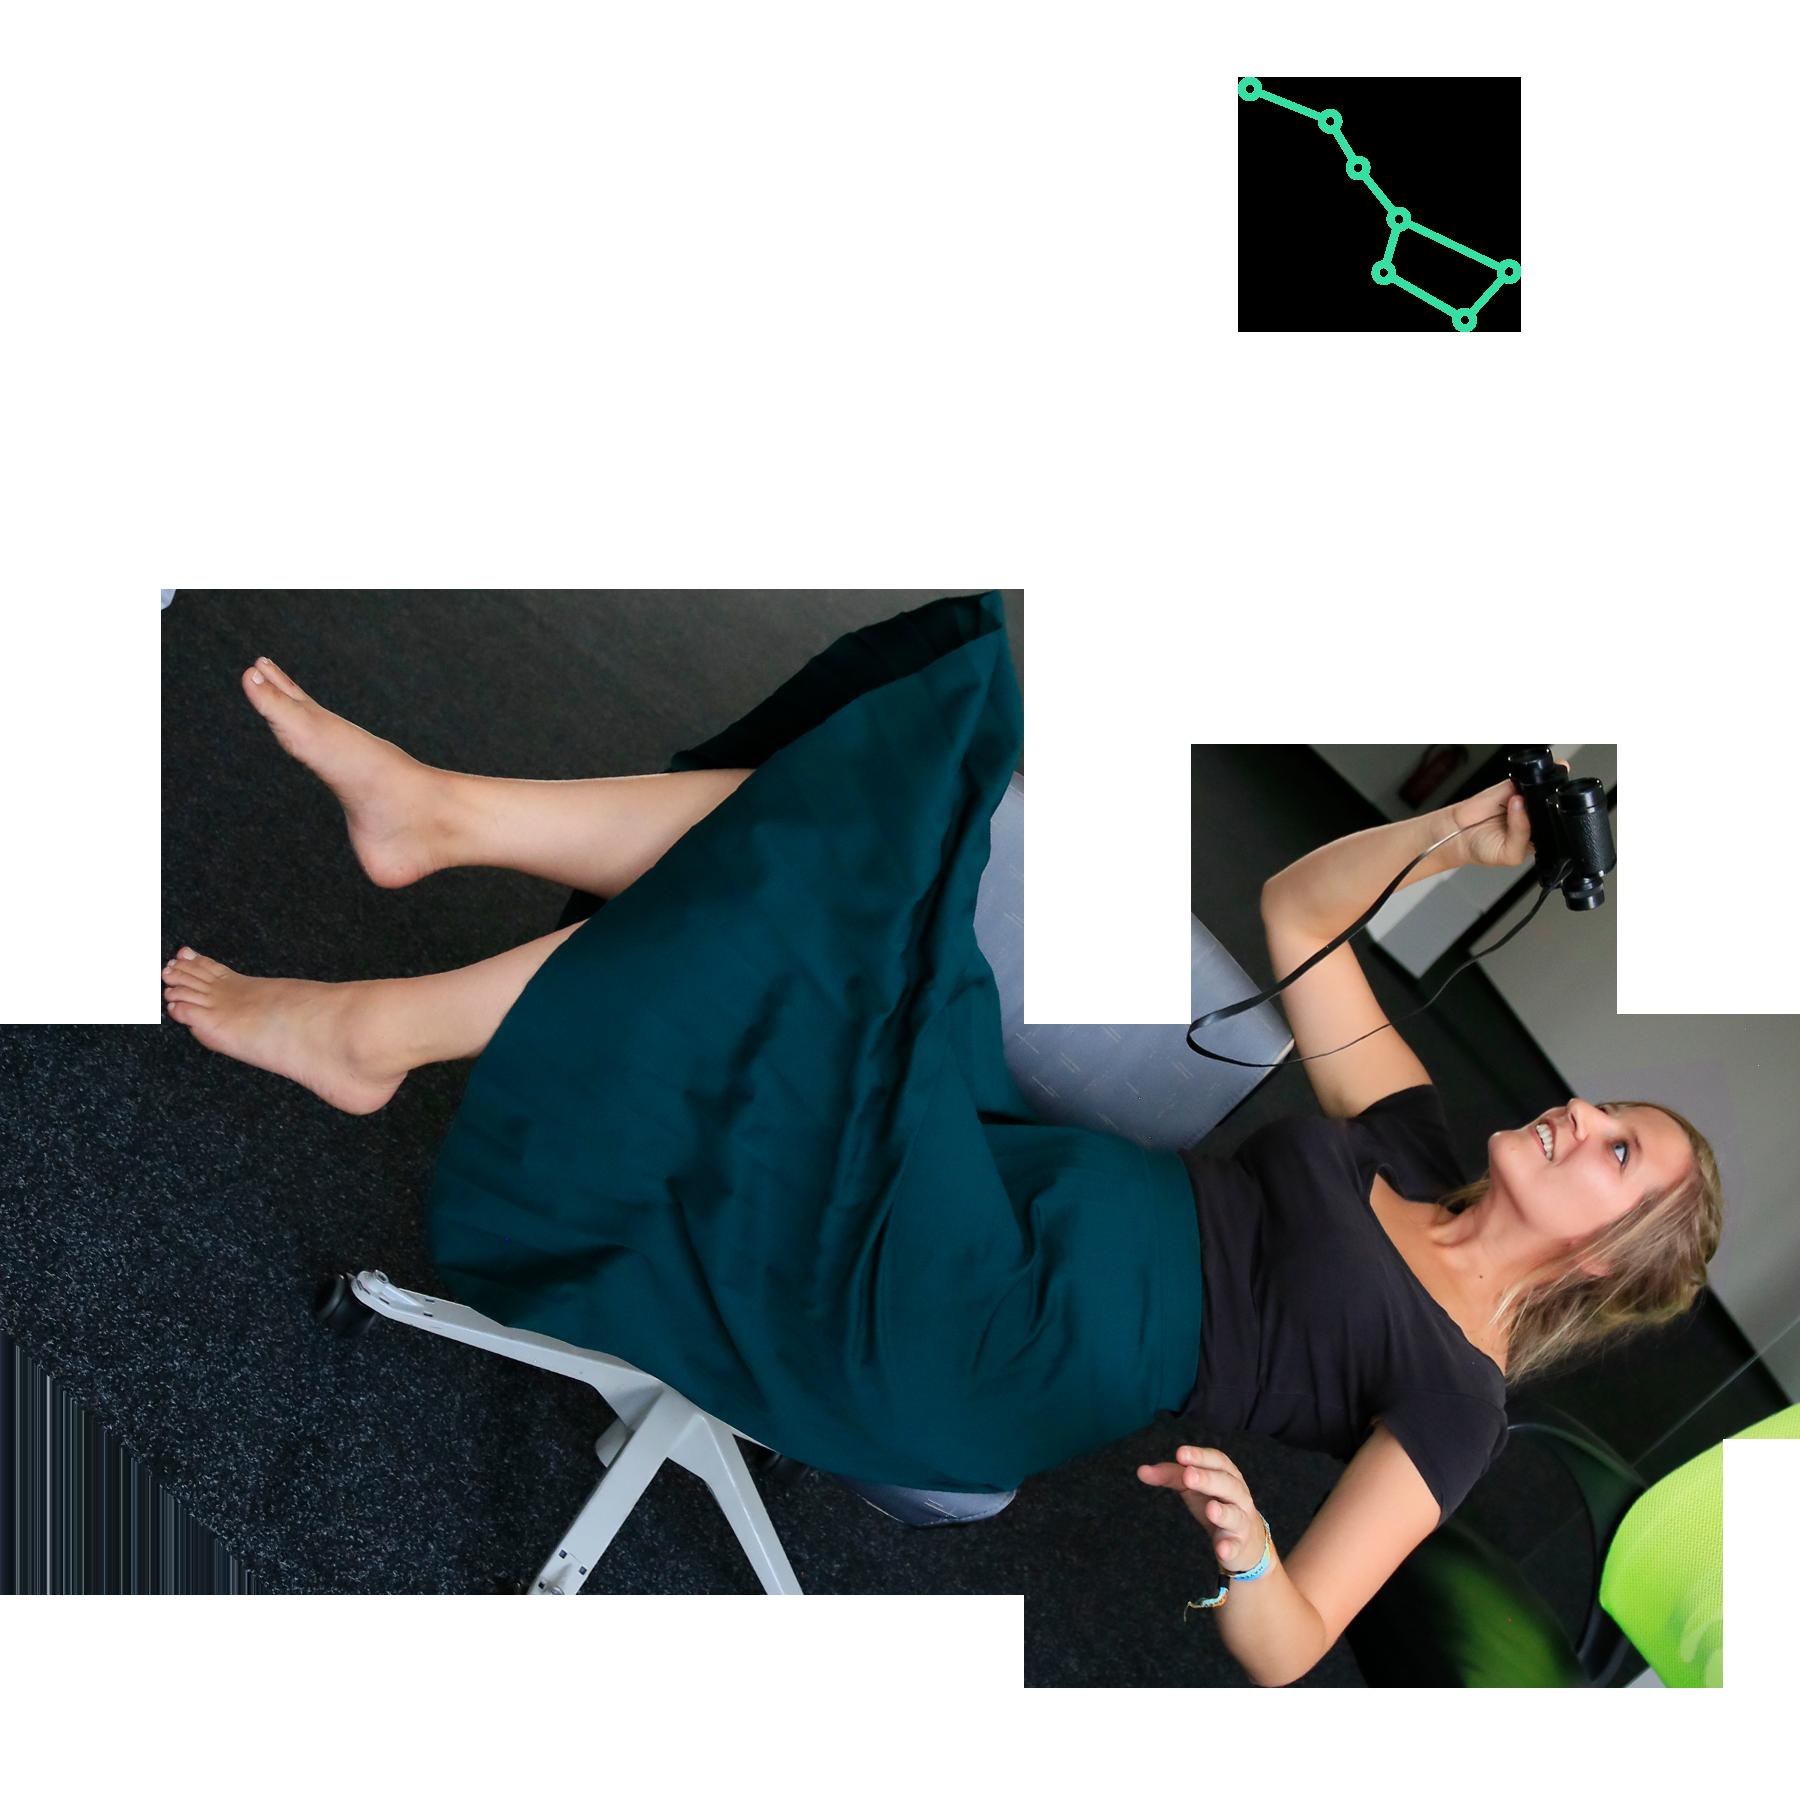 hanna-schwebebild